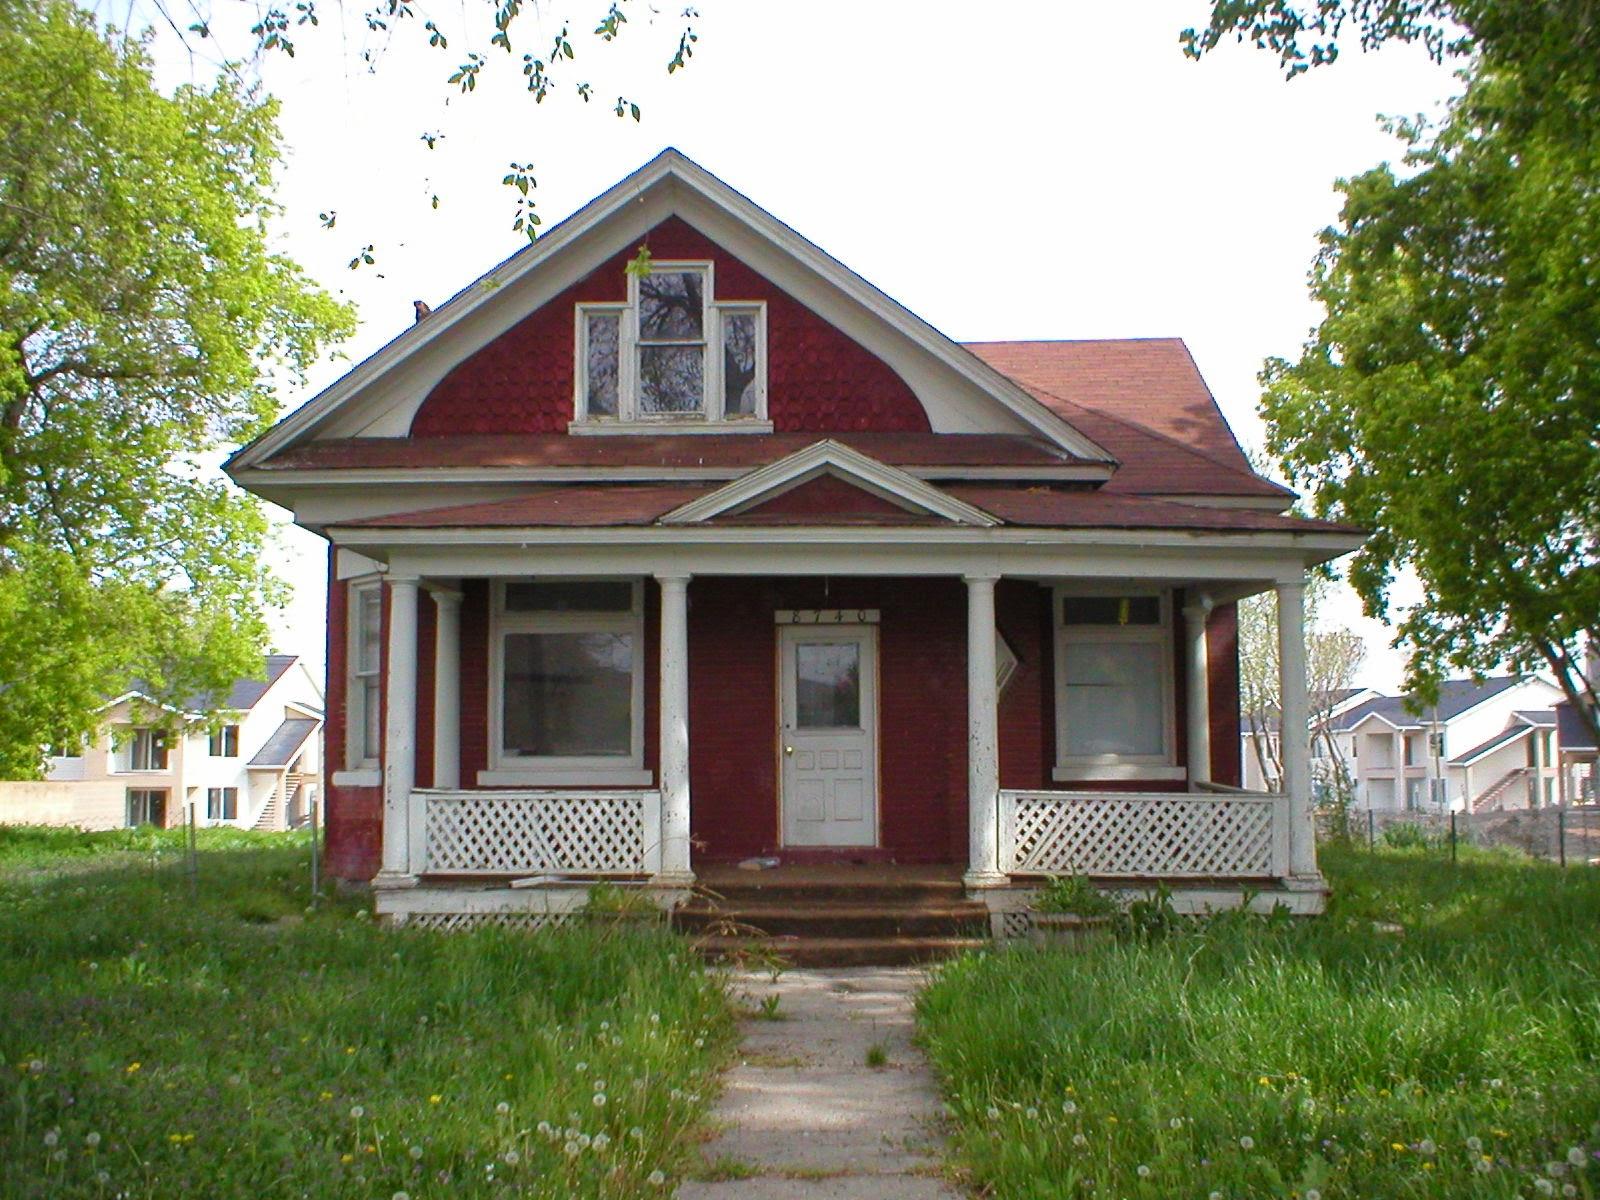 A Primer On Craigslist Housing Scams Modern Mormon Men